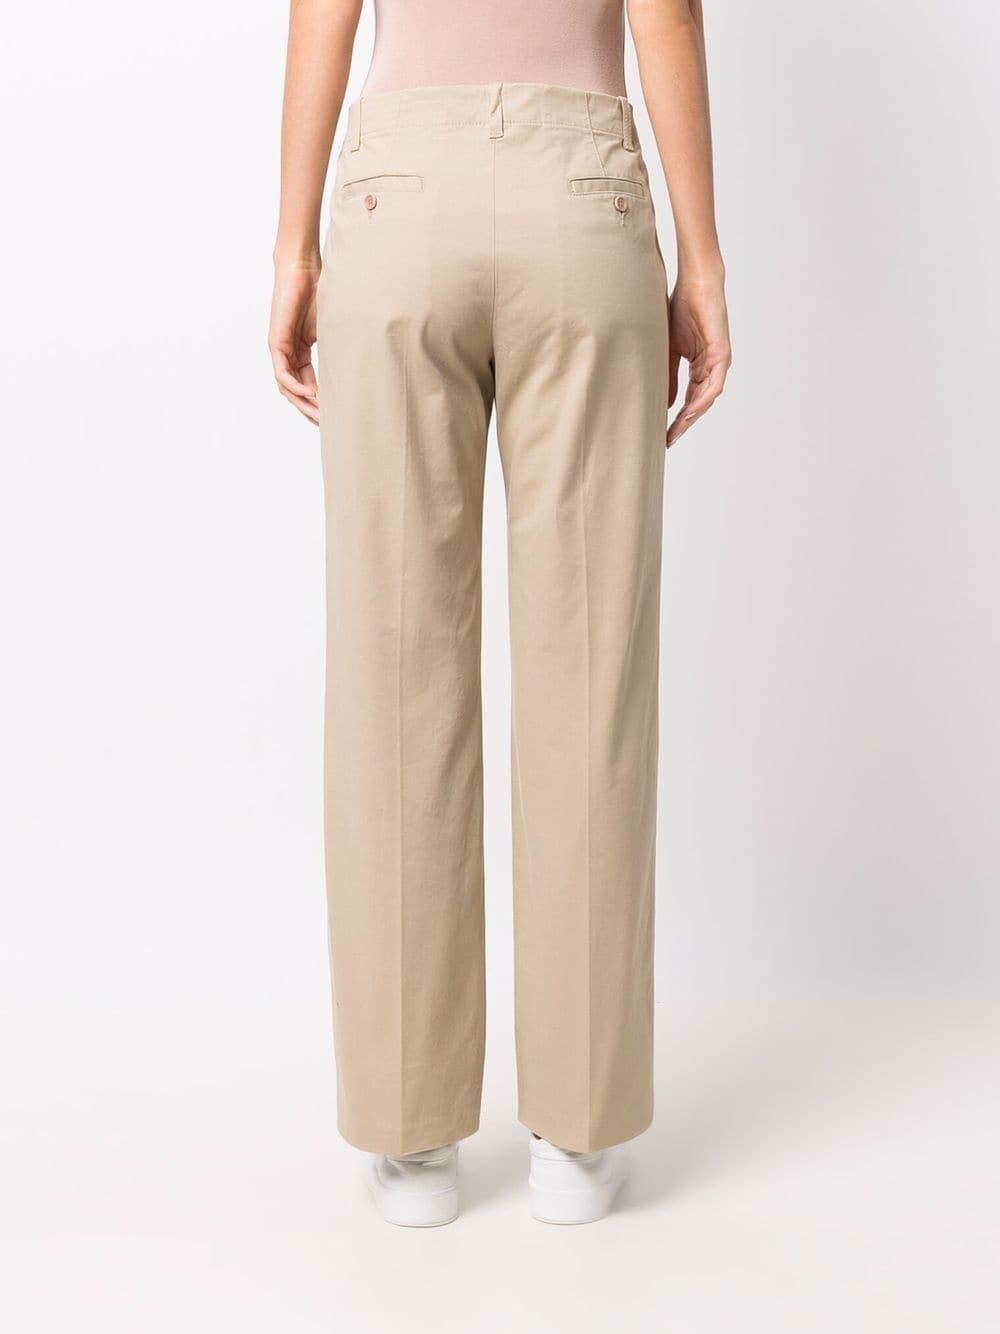 Pantaloni a gamba larga in cotone beige ASPESI   Pantaloni   0112-G39801047